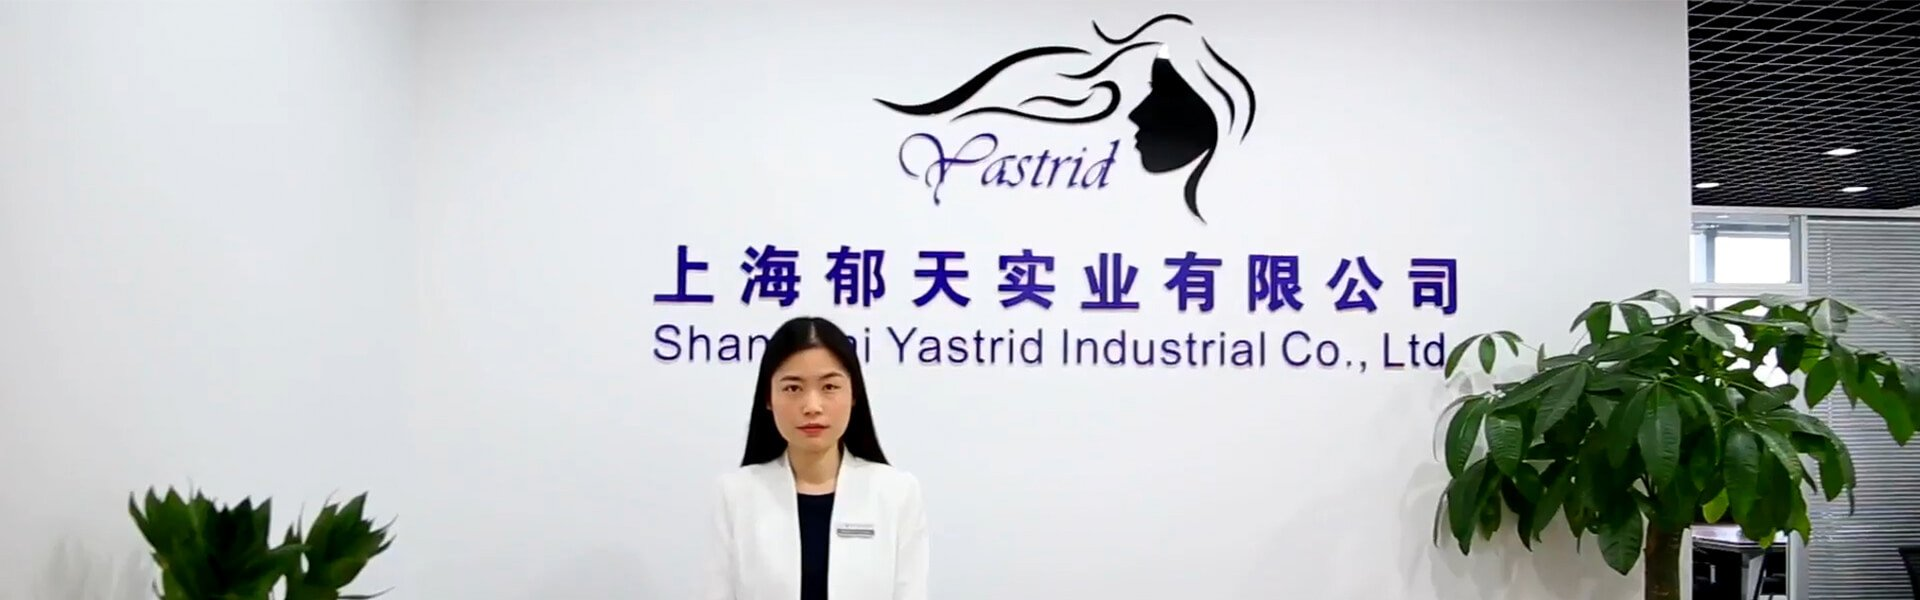 Yastrid-China Top Quality PDO Thread Supplier